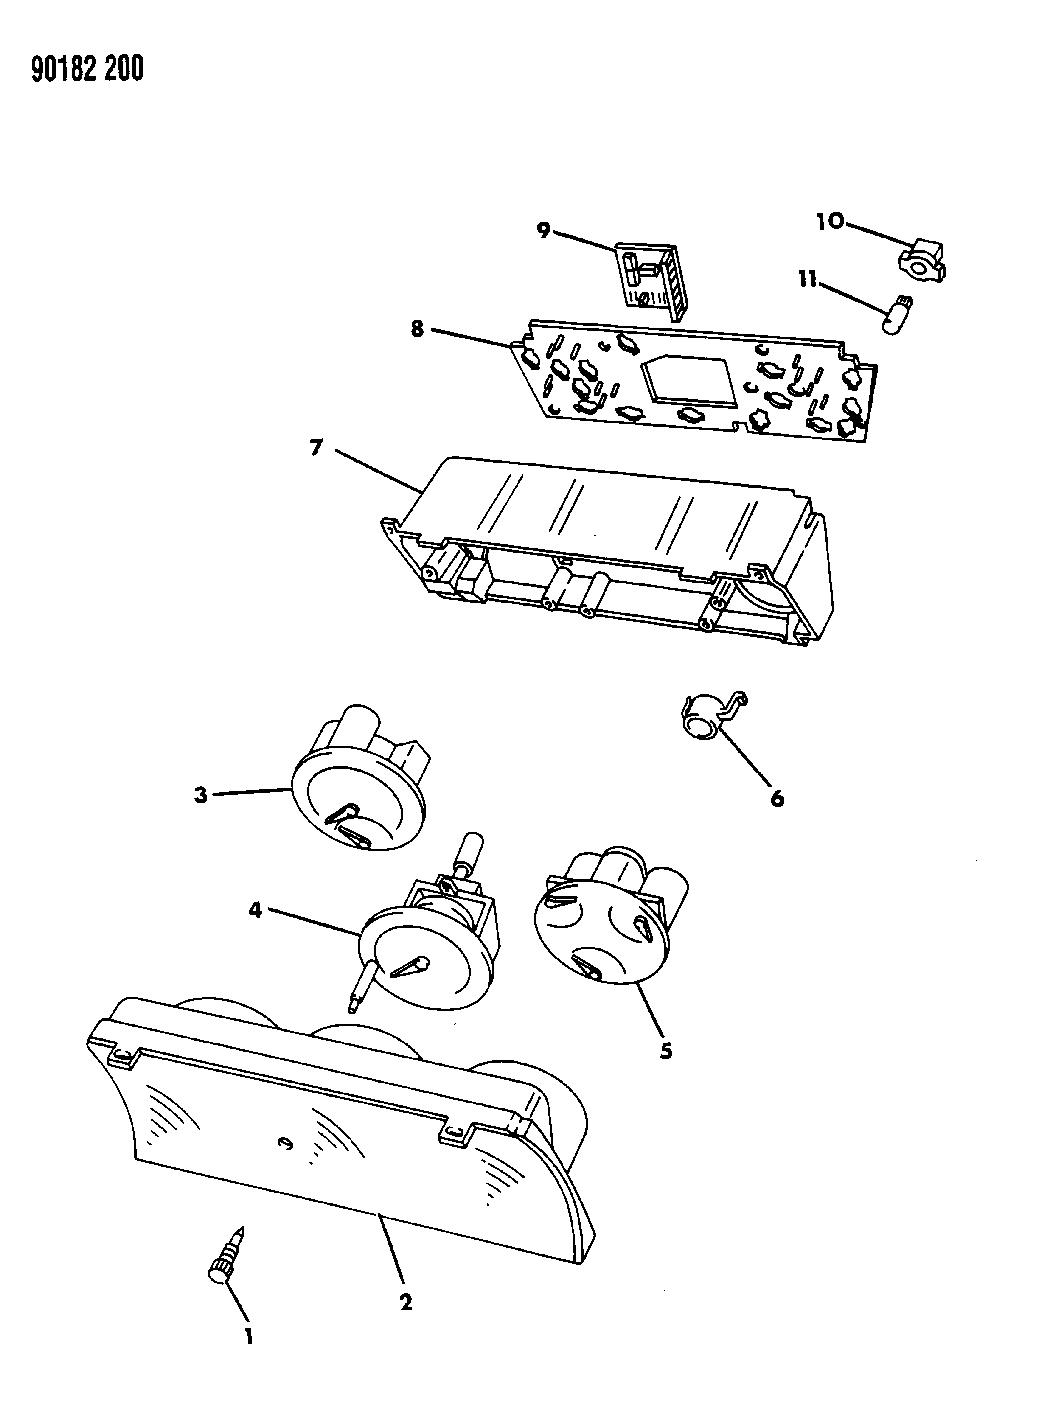 1990 Dodge Omni Instrument Panel Cluster Mopar Parts Giant Wiring Diagram